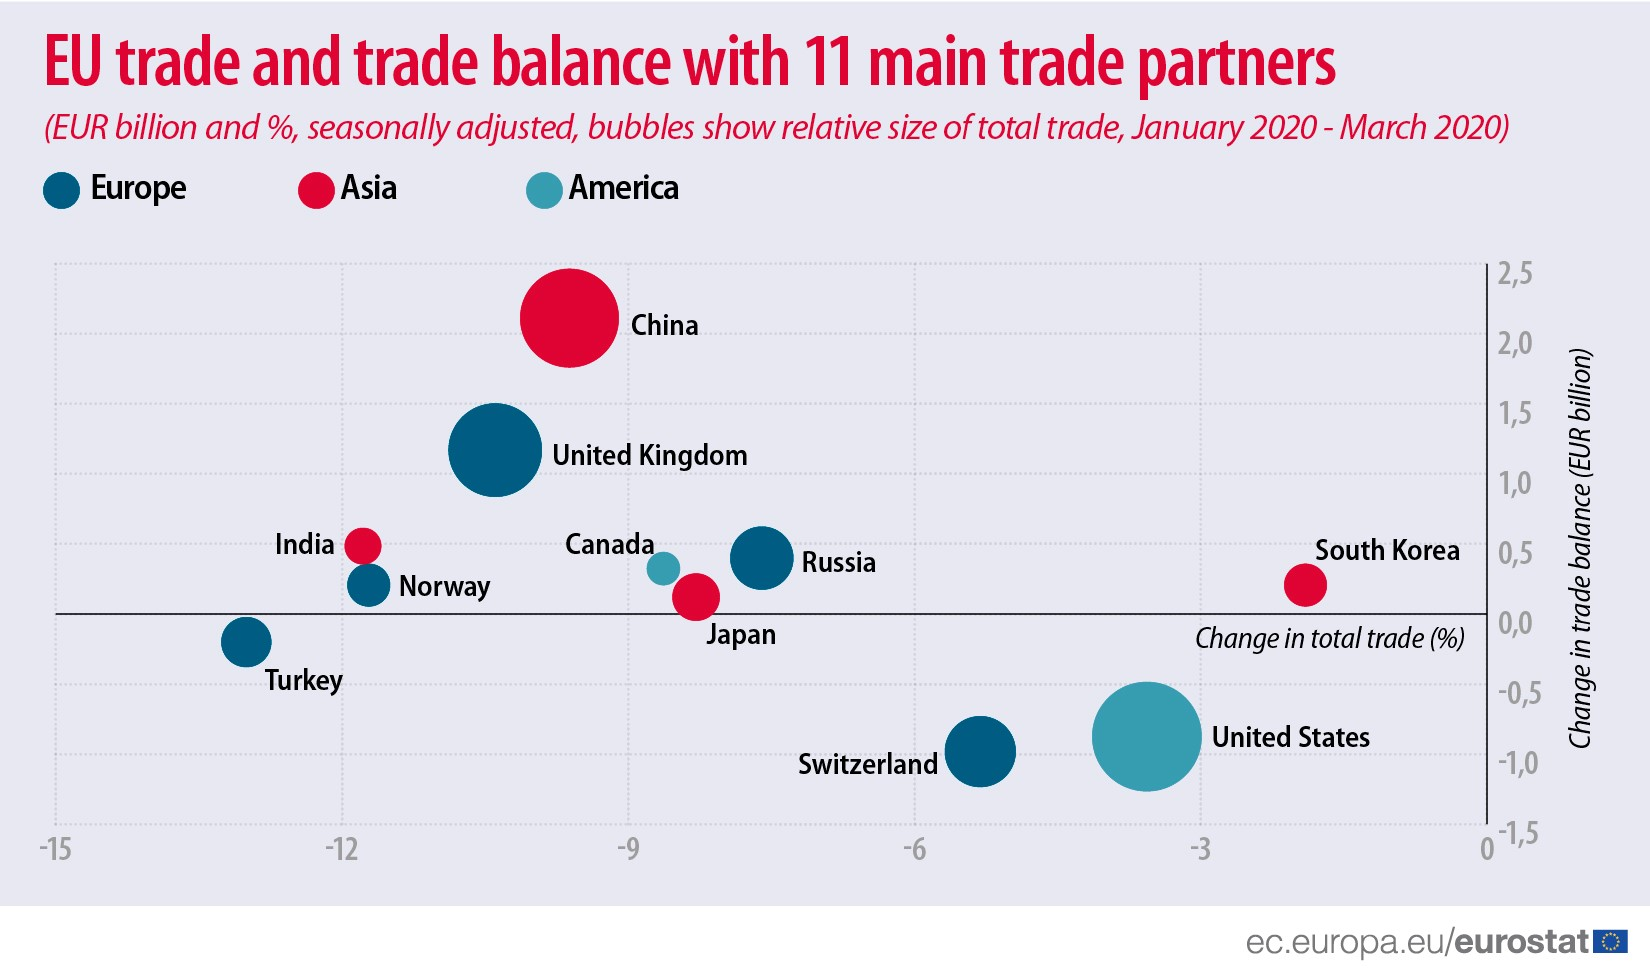 EU trade and trade balance with 11 main trade partners, January - March 2020